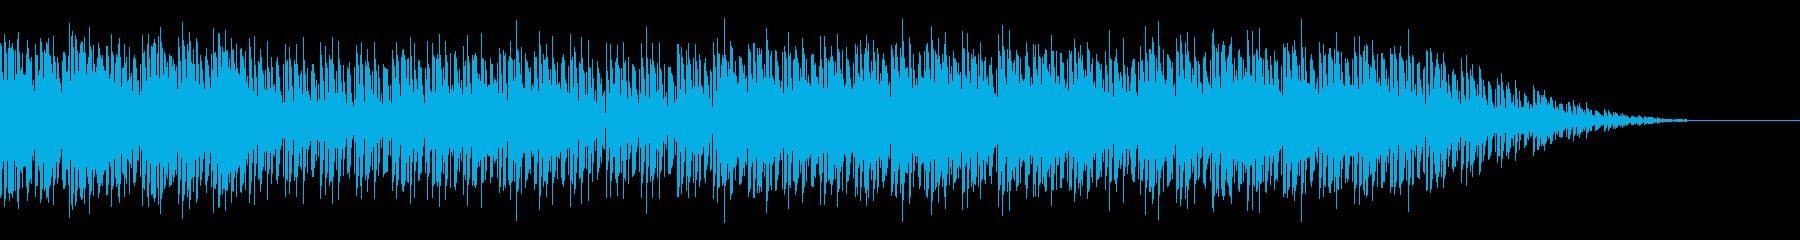 80s風 シンセウェーブ 未来 懐かしいの再生済みの波形